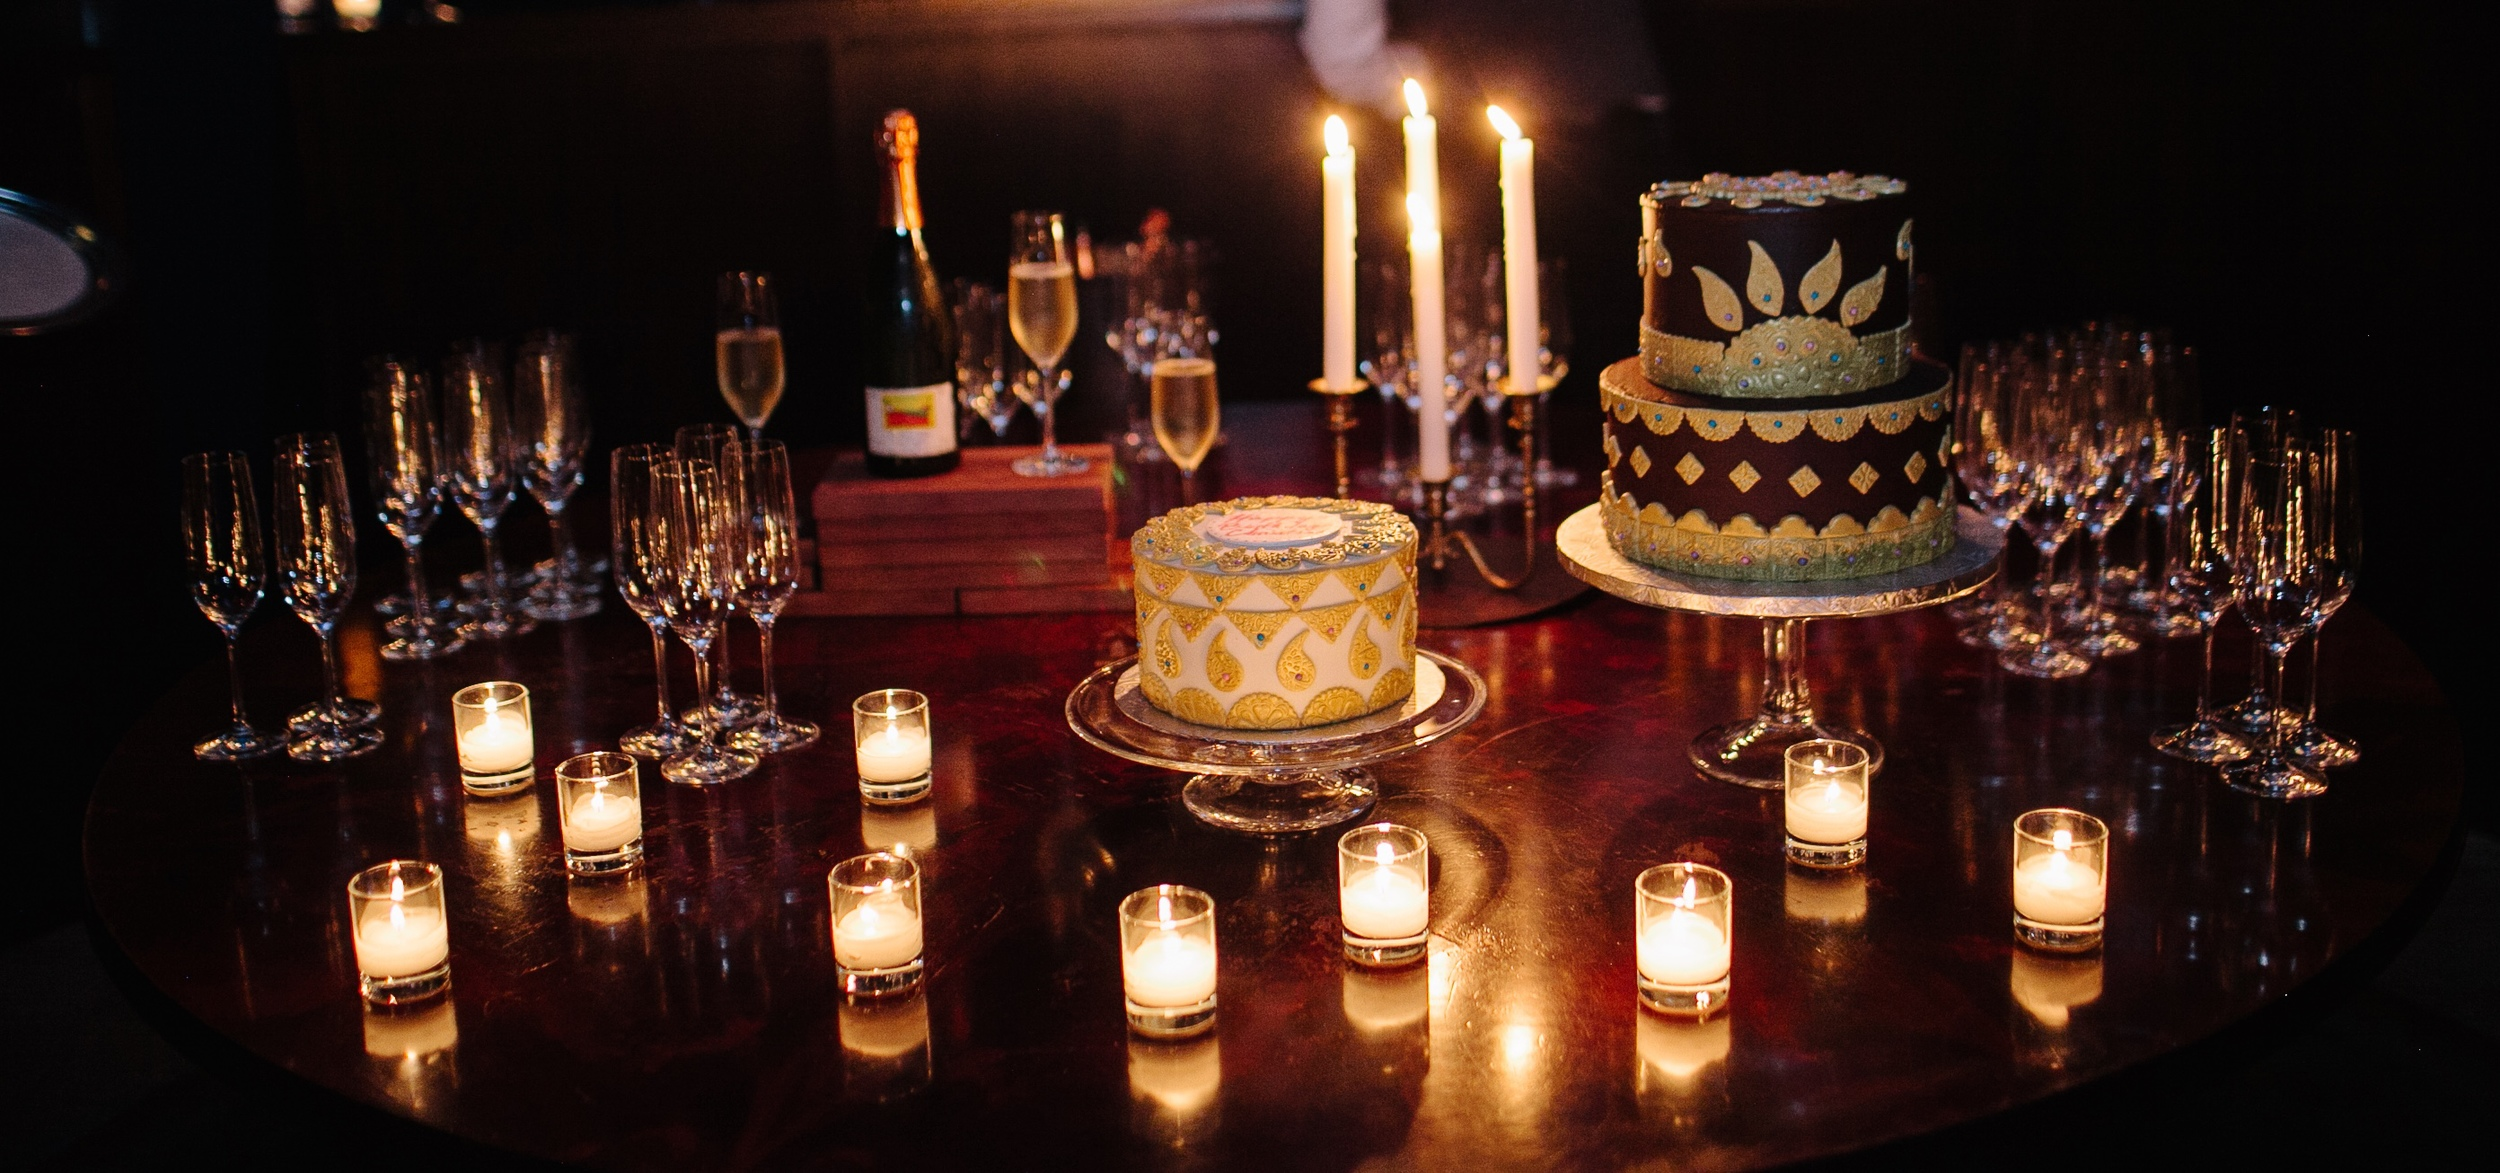 CUPOLA CHAMPAGNE BAR & CAKE DISPLAY